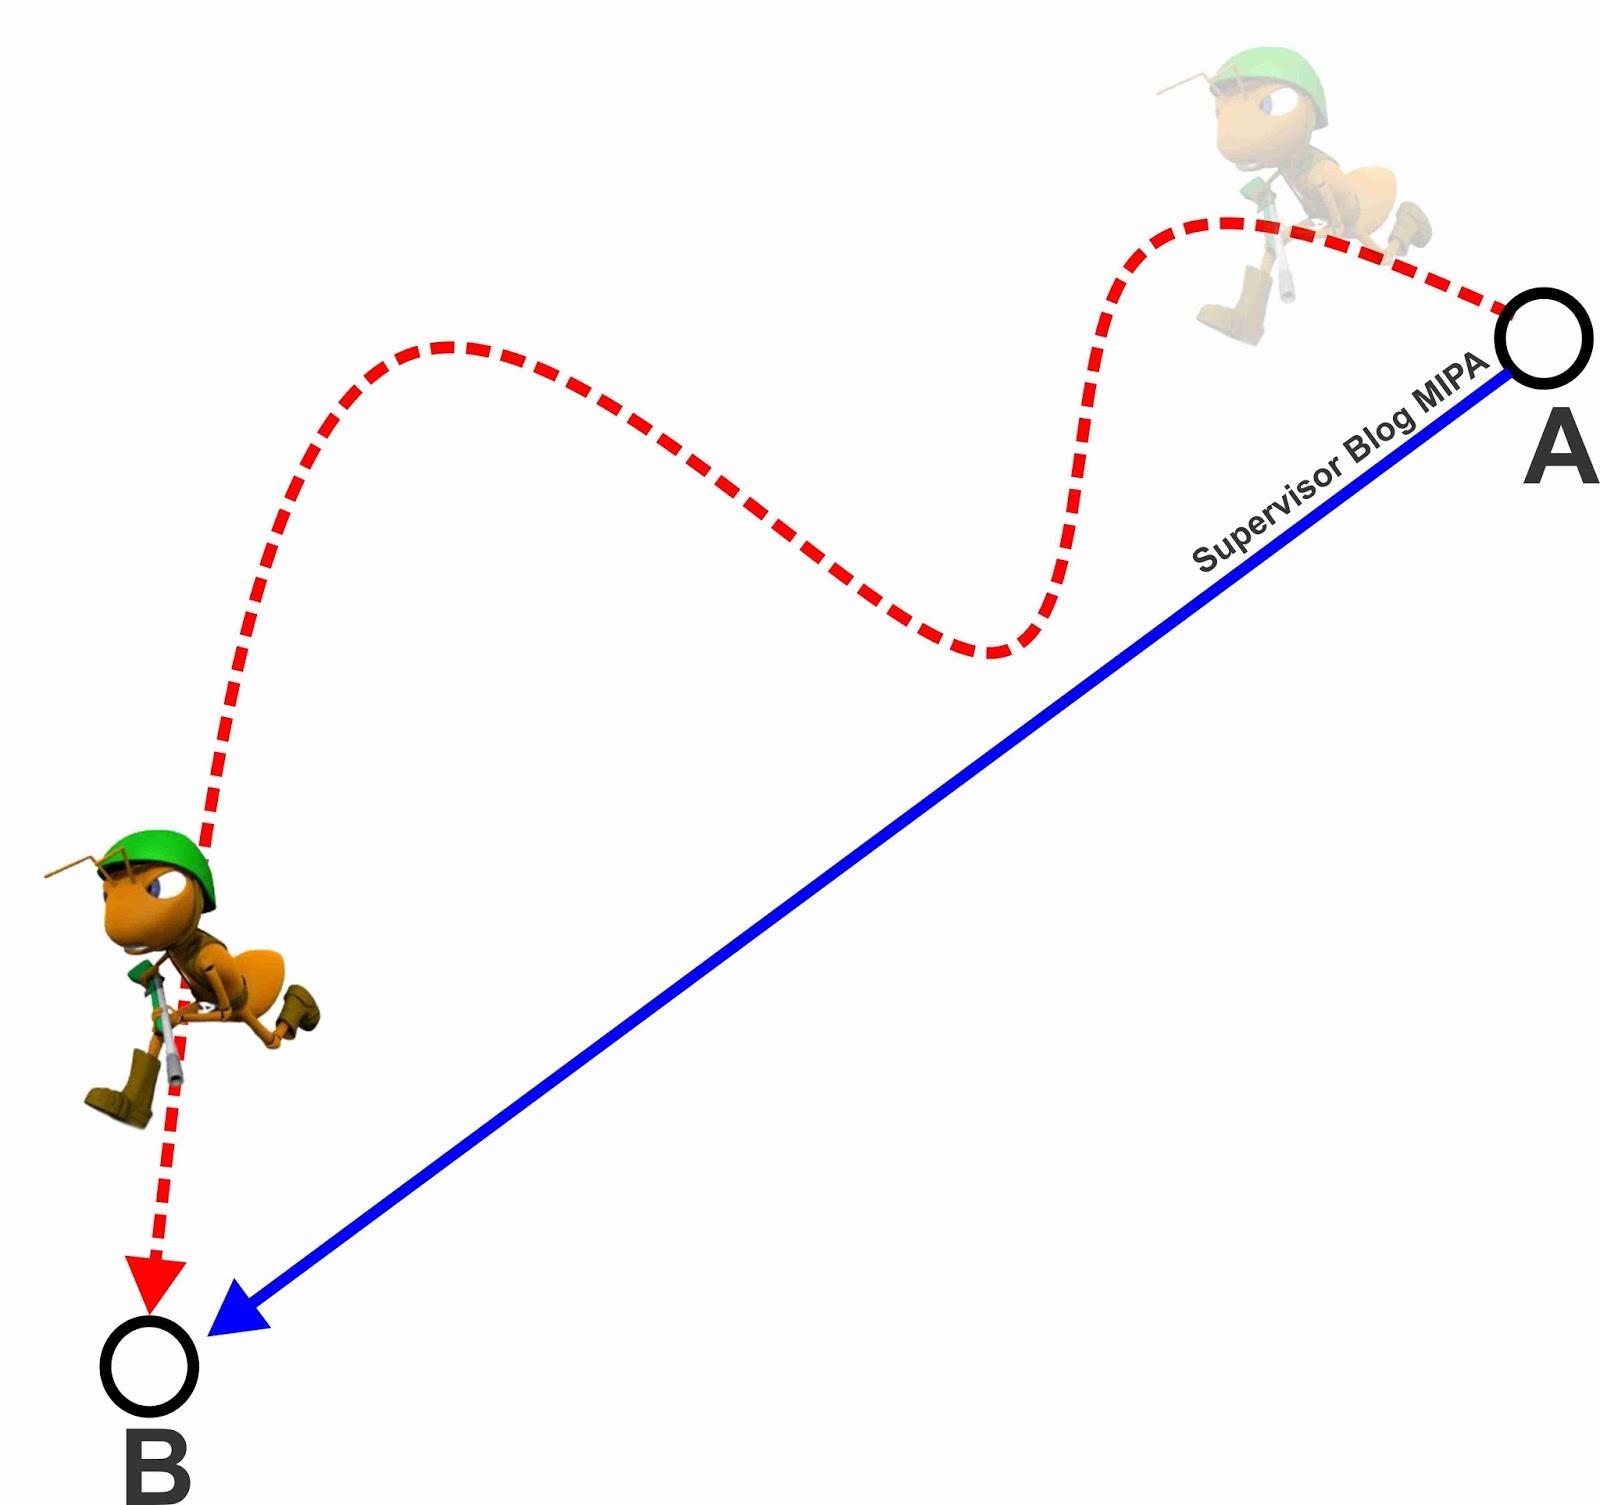 Pengertian Dan Contoh Besaran Vektor Dan Skalar Beserta Simbol Dan